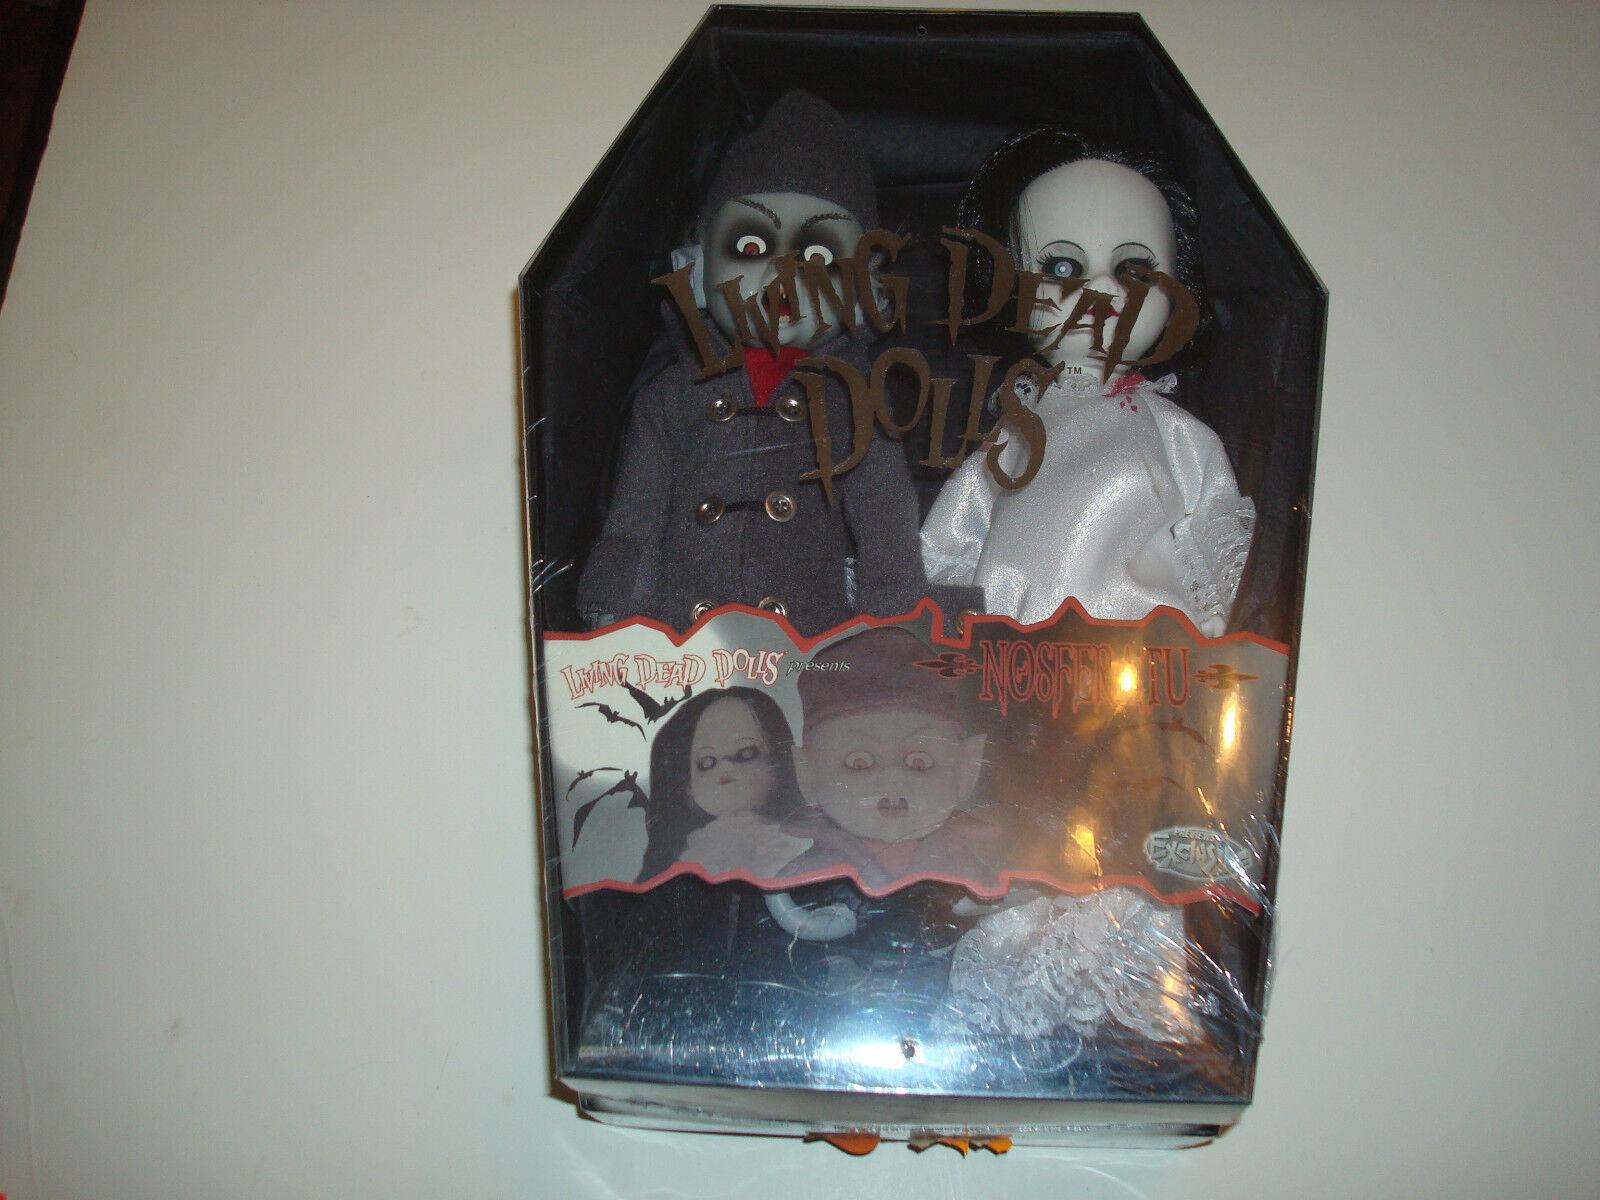 Living Dead bambolas   Nosteritu e Victim   consegna rapida